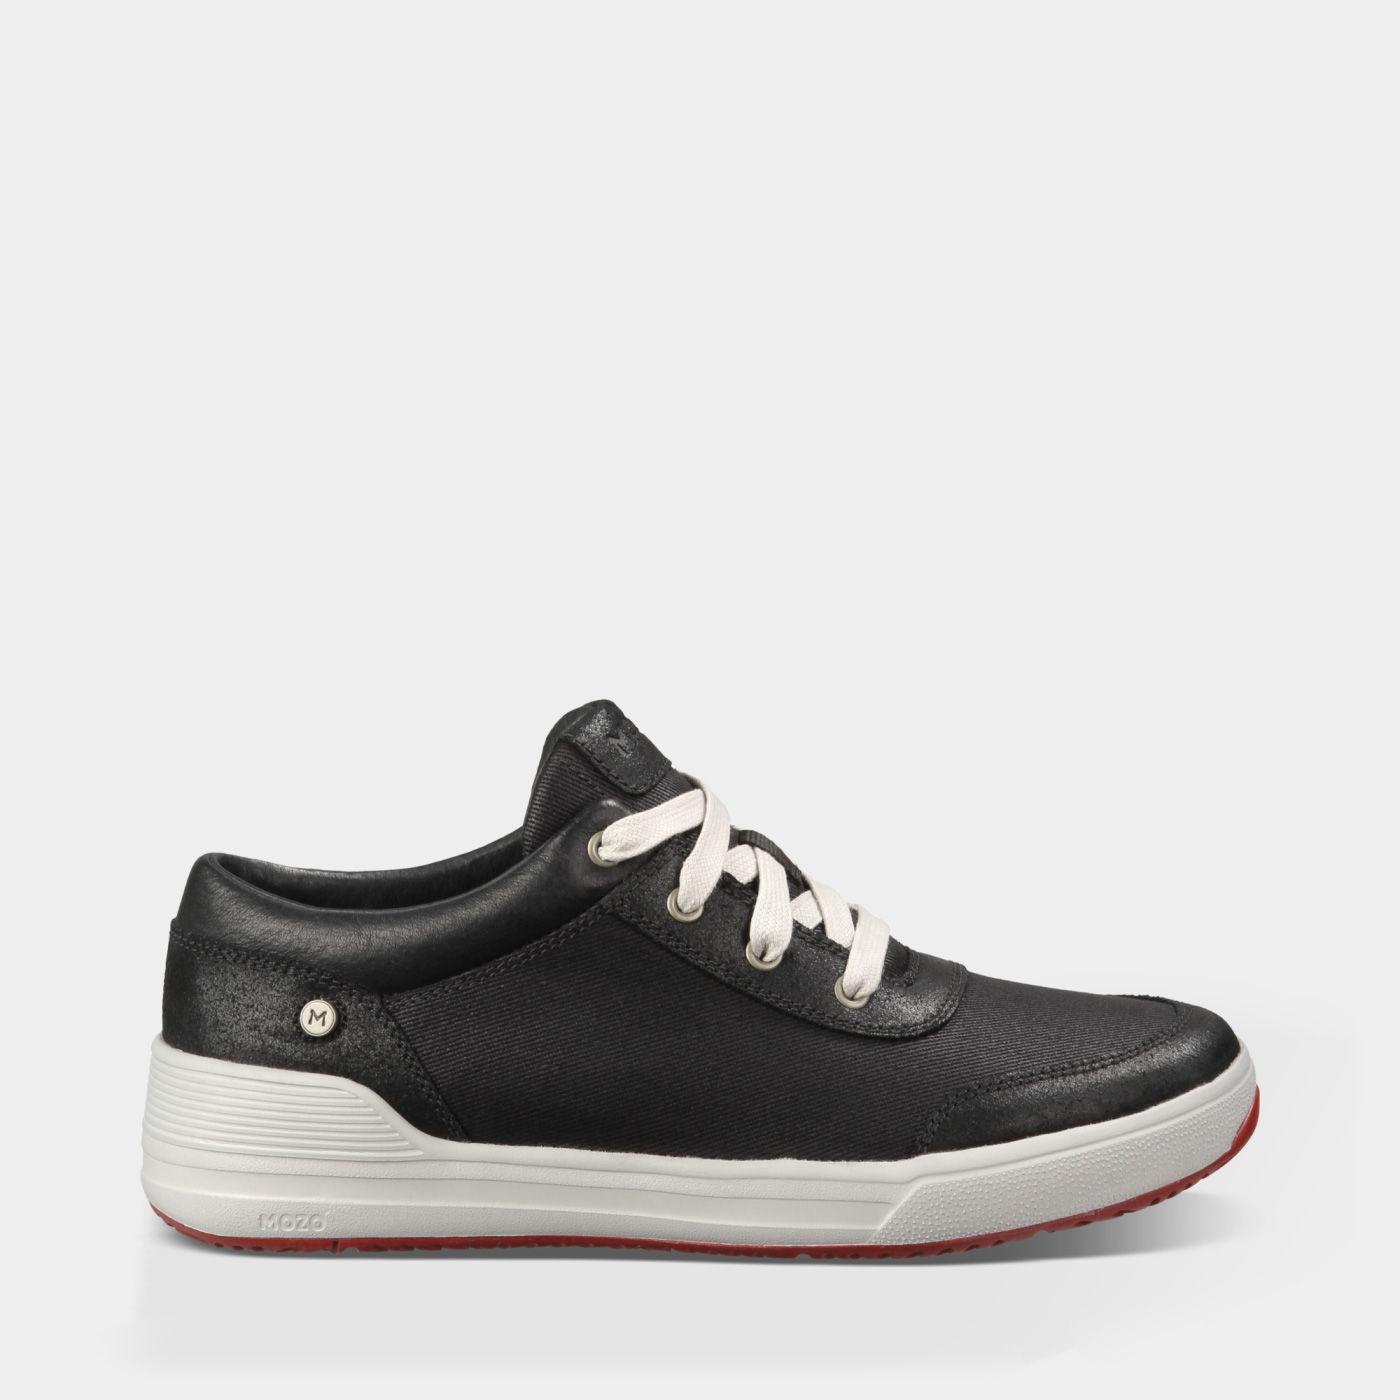 mozo 3837 bkw 15 s low canvas shoes slip